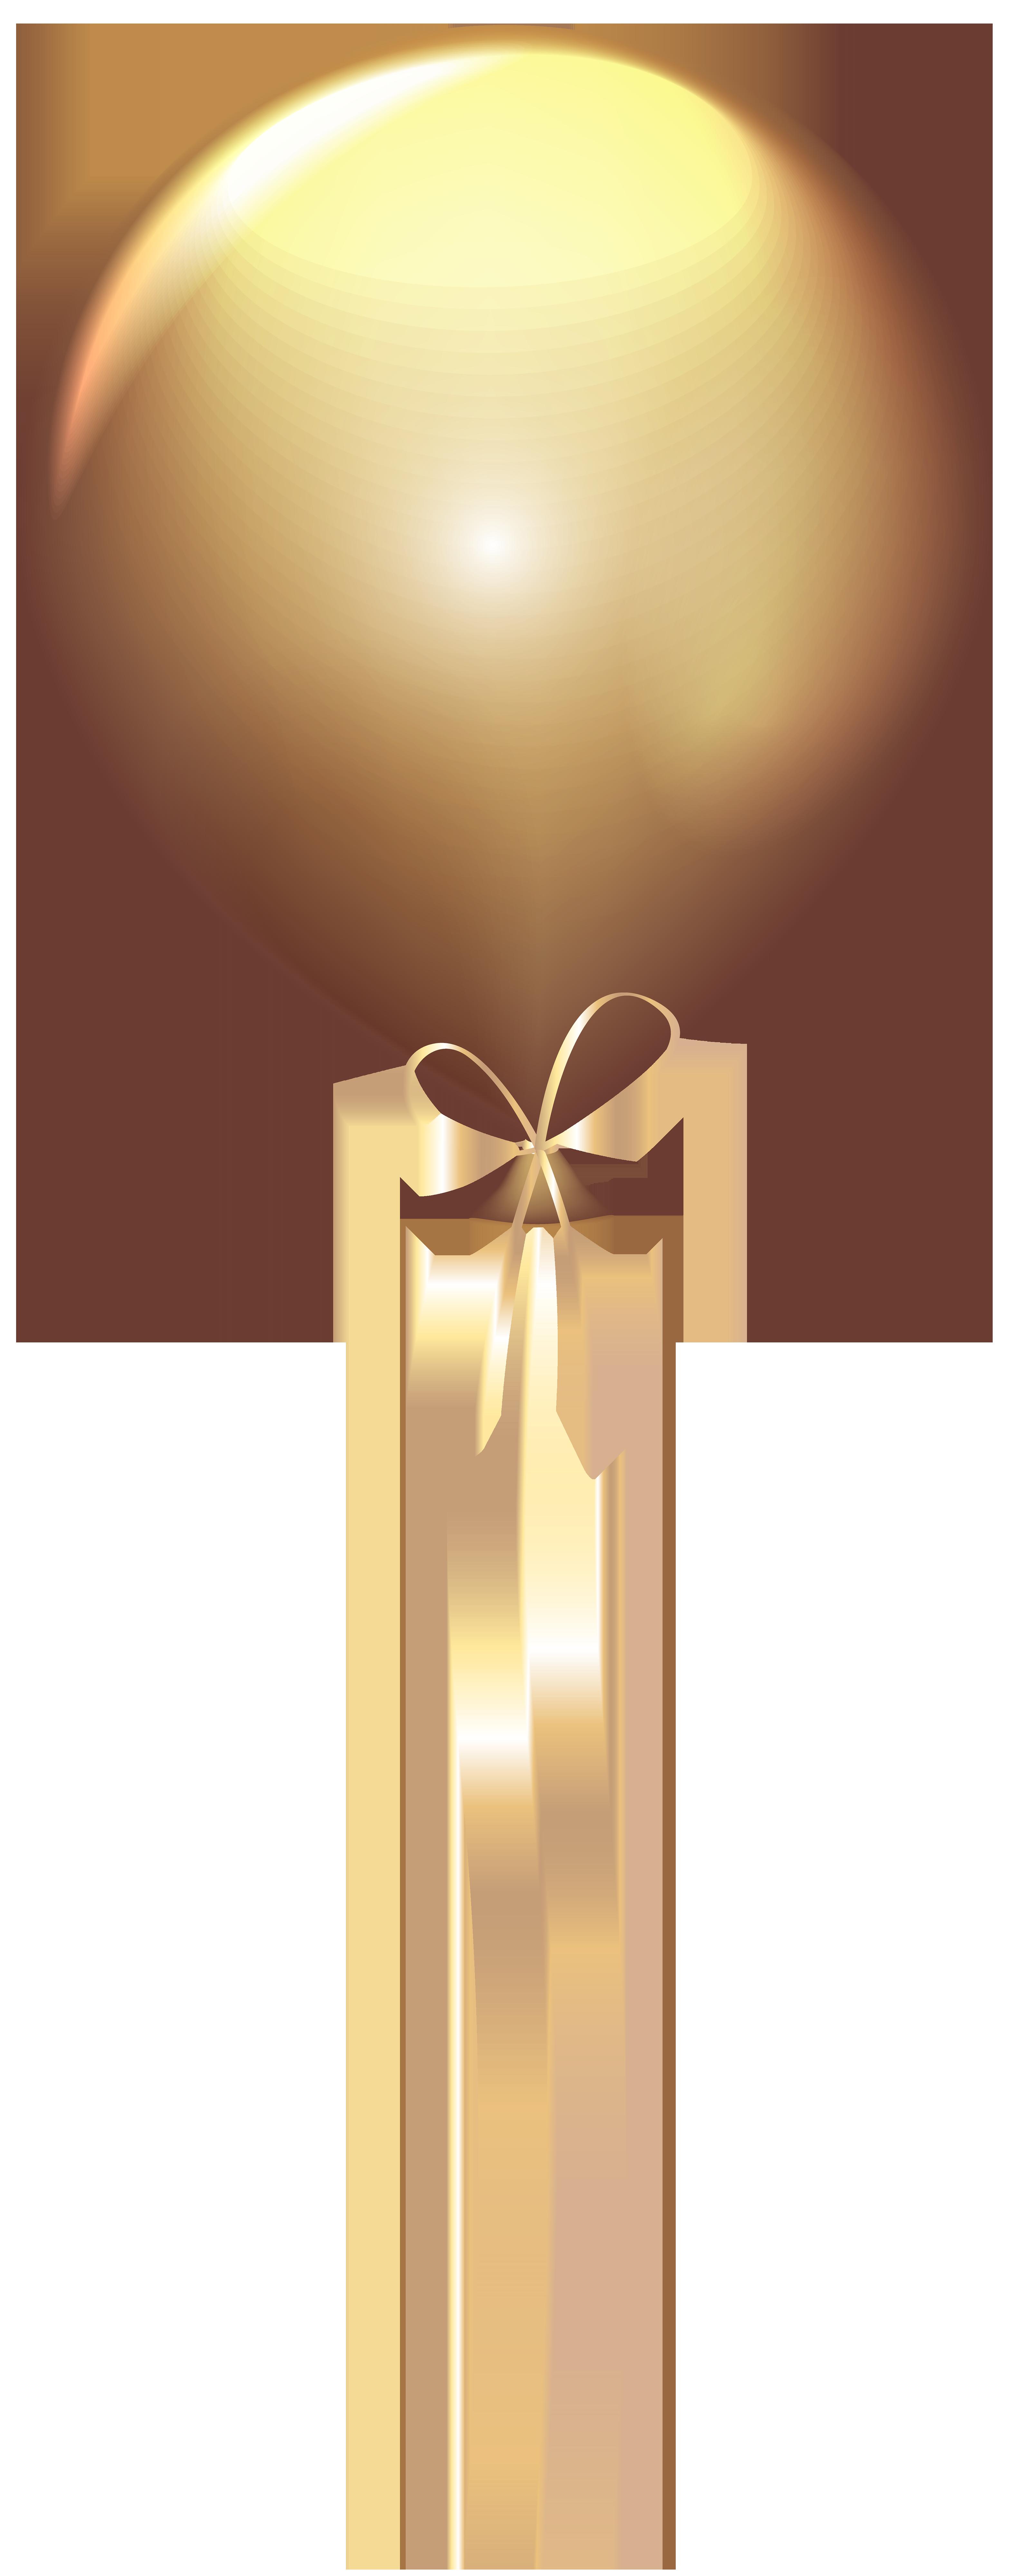 Clipart balloon rose gold. Transparent clip art image